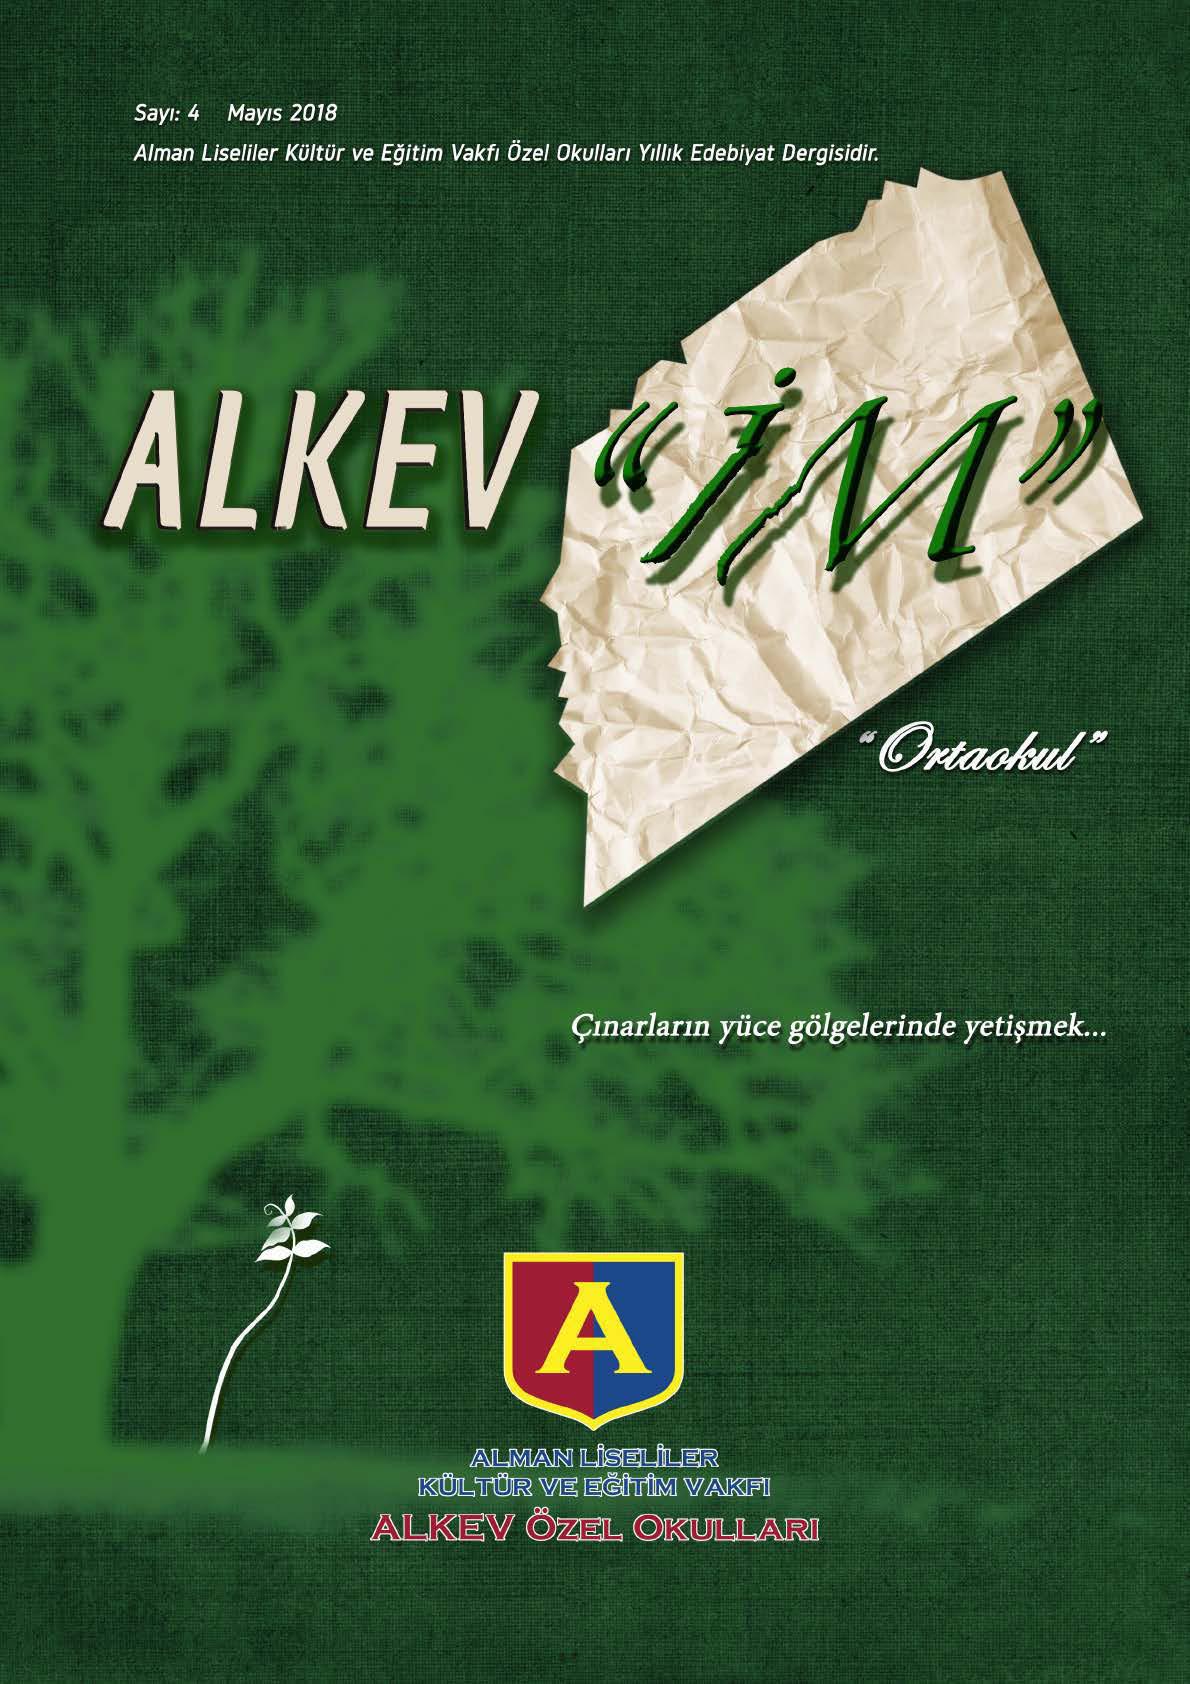 ALKEV'İM' Ortaokul - Sayı: 4 / Mayıs 2018